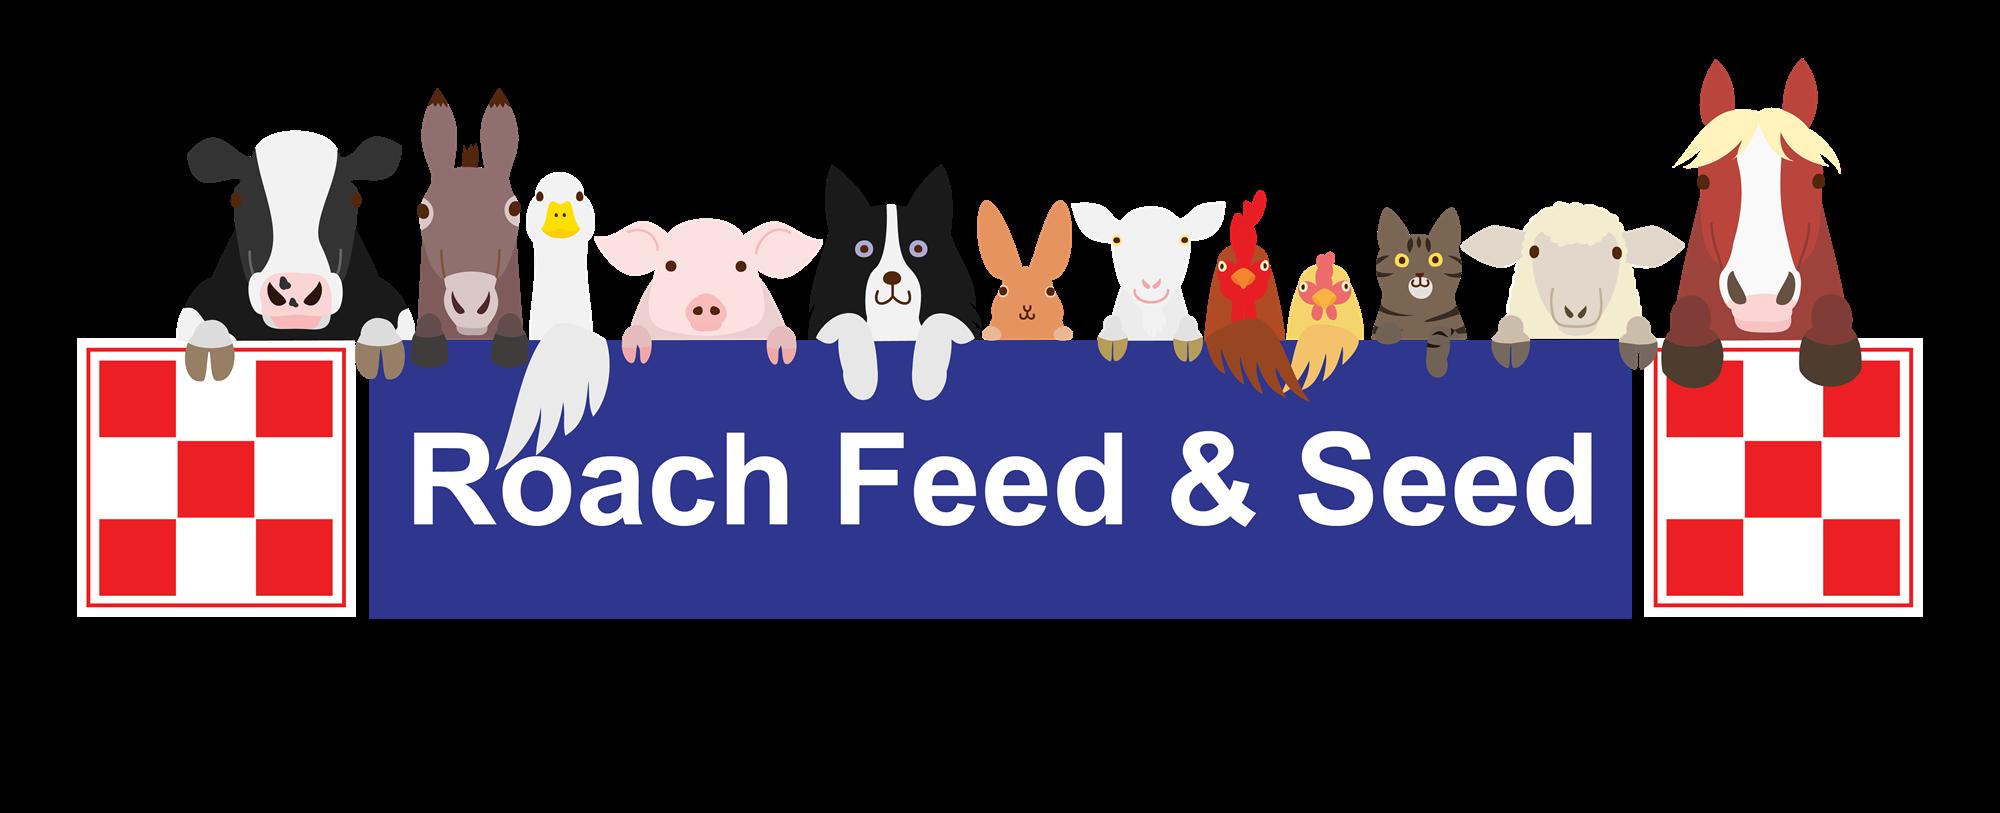 Roach Feed & Seed